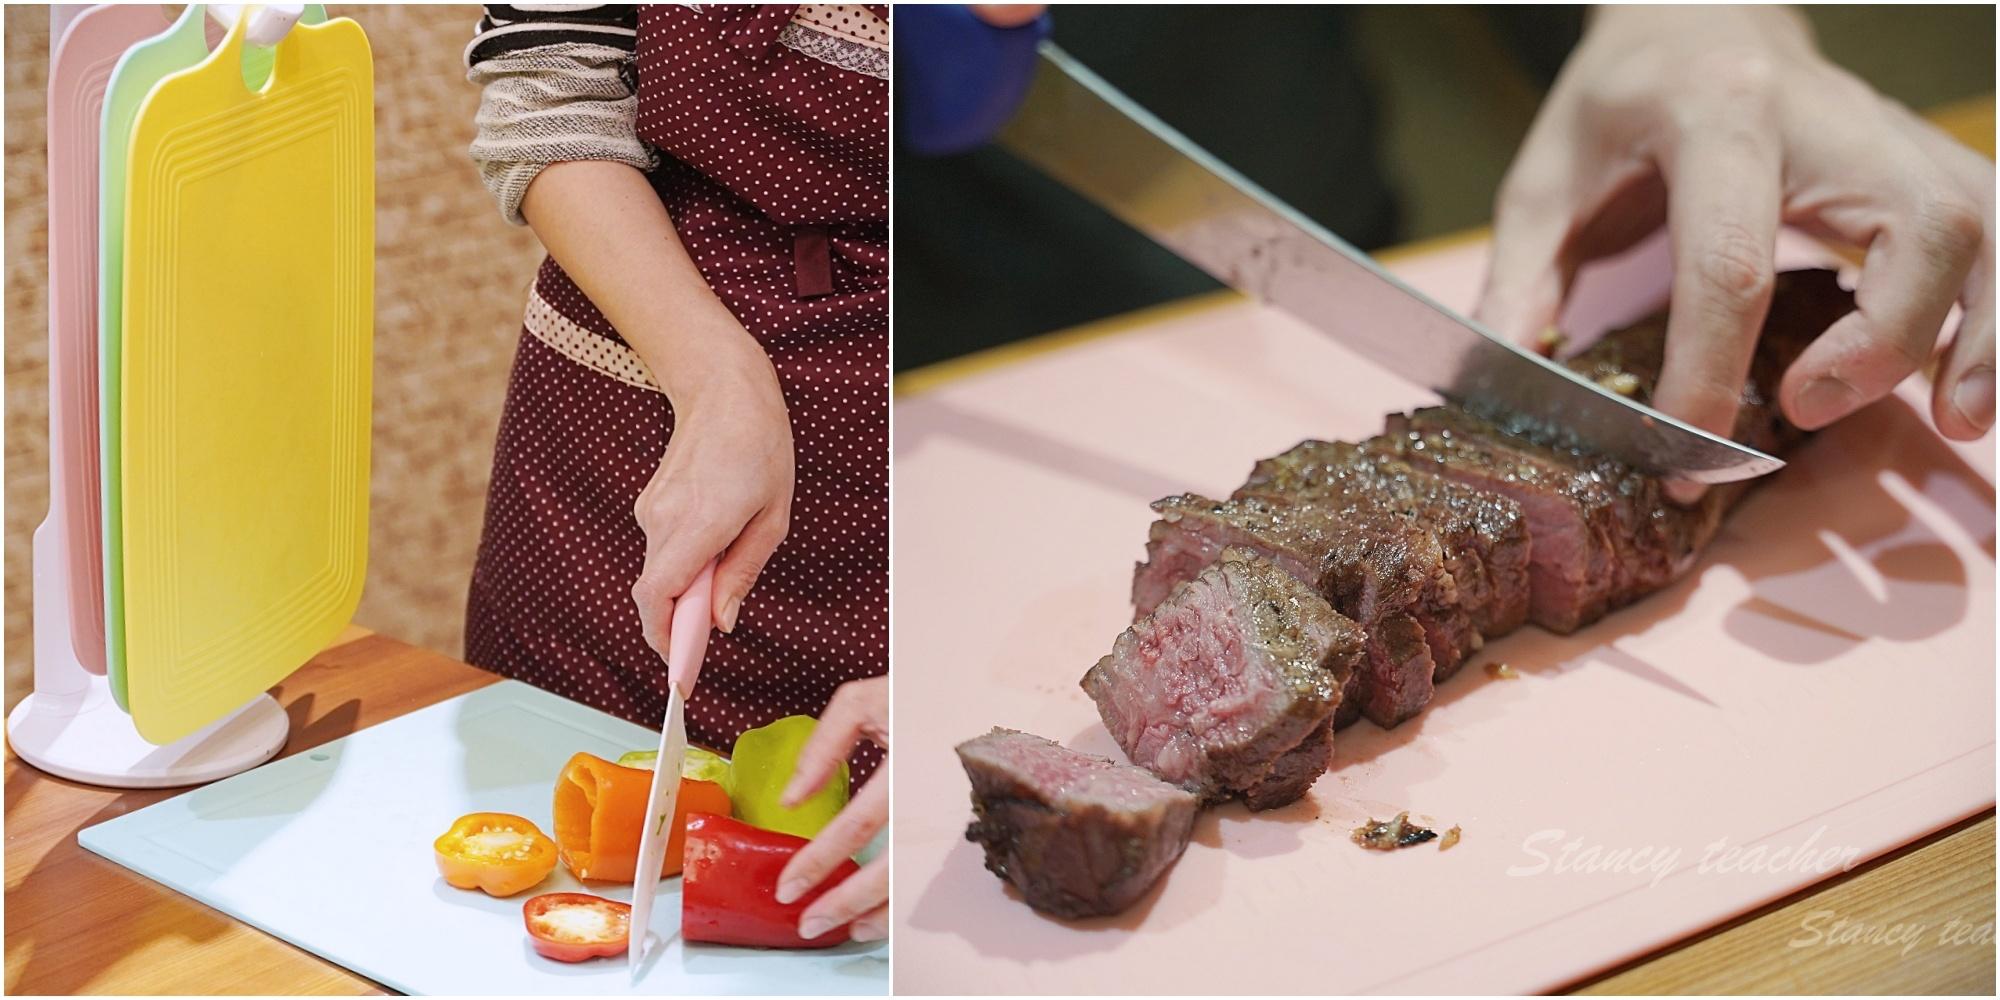 Zaniin TPU 刻度方形砧板組|環保無毒耐熱菜板|好用菜板推薦